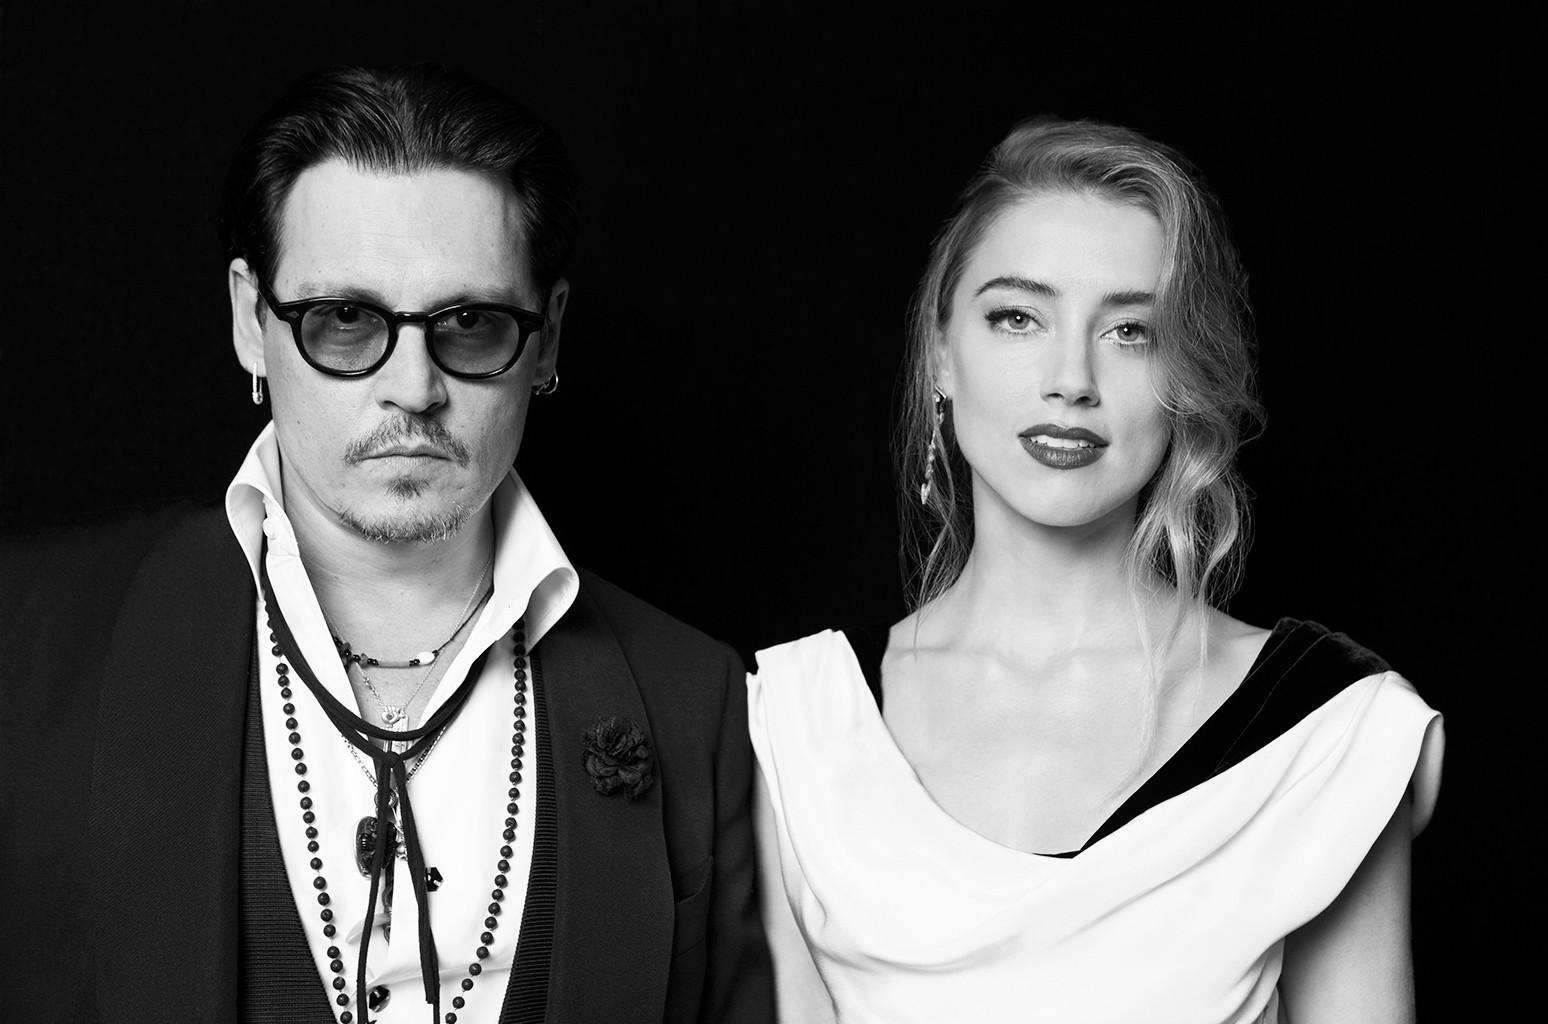 Johnny Depp and Amber Heard